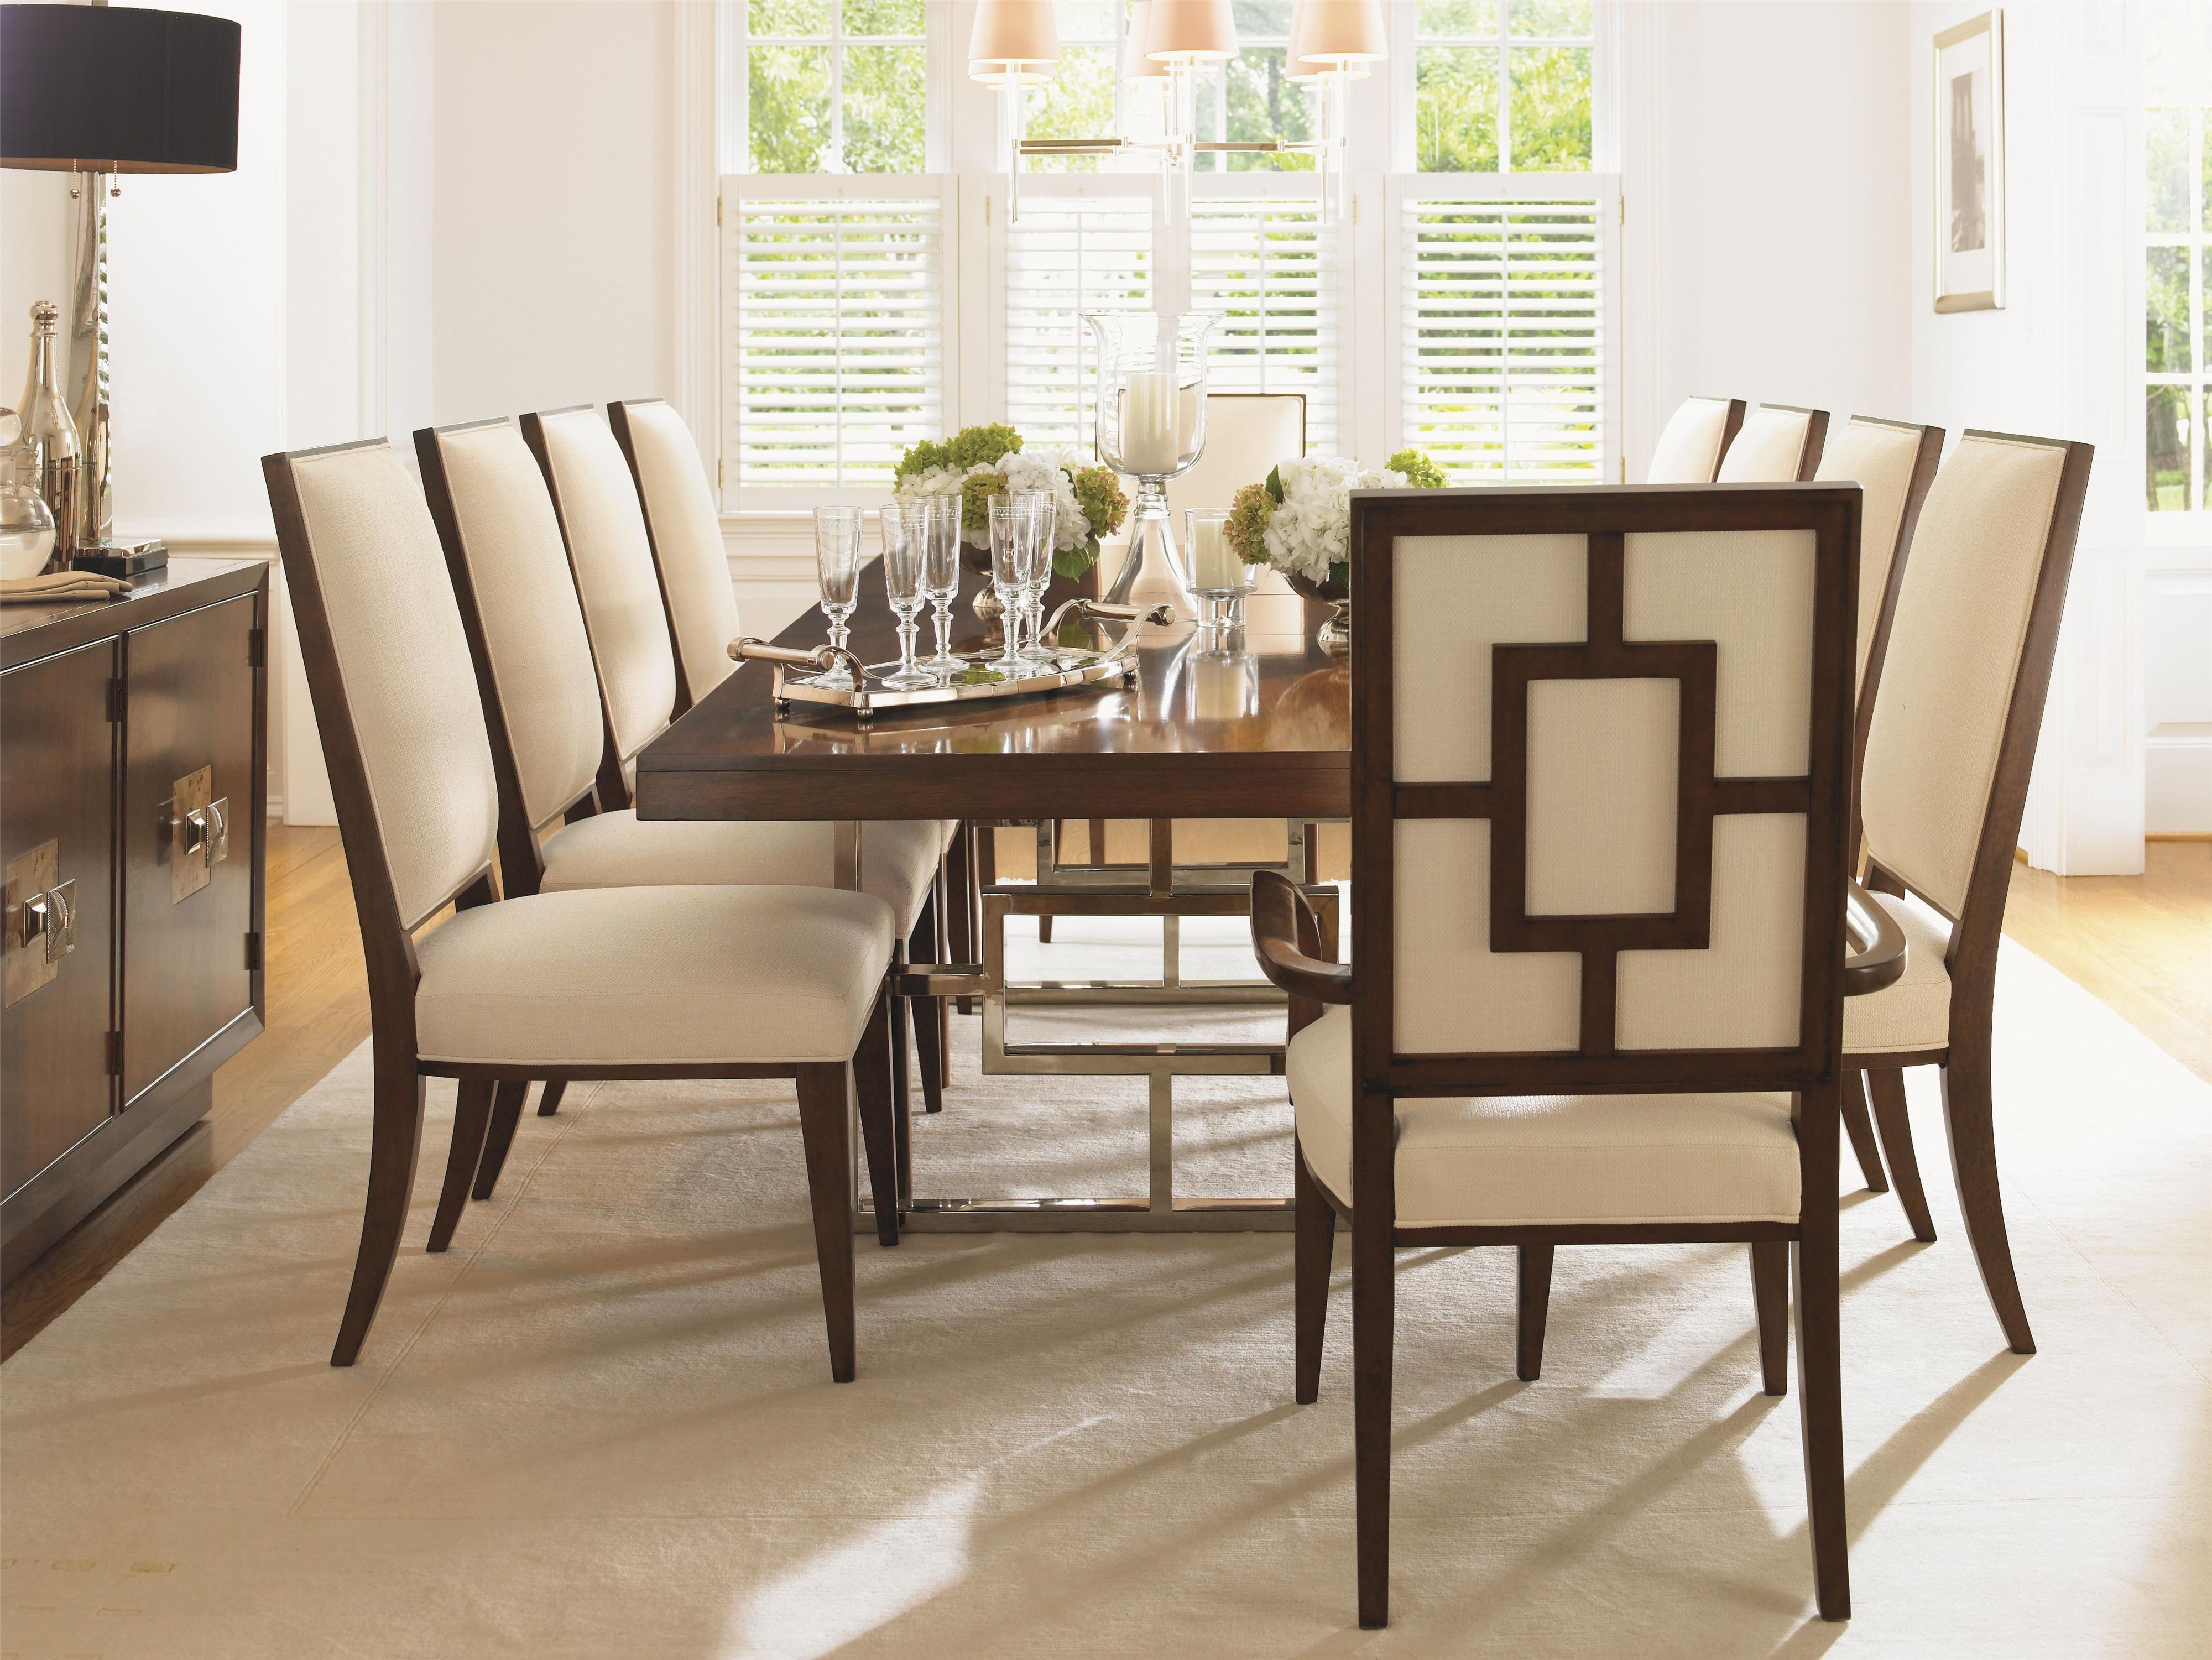 Mirage (458) By Lexington Home Brands   Sprintz Furniture   Lexington Home  Brands Mirage